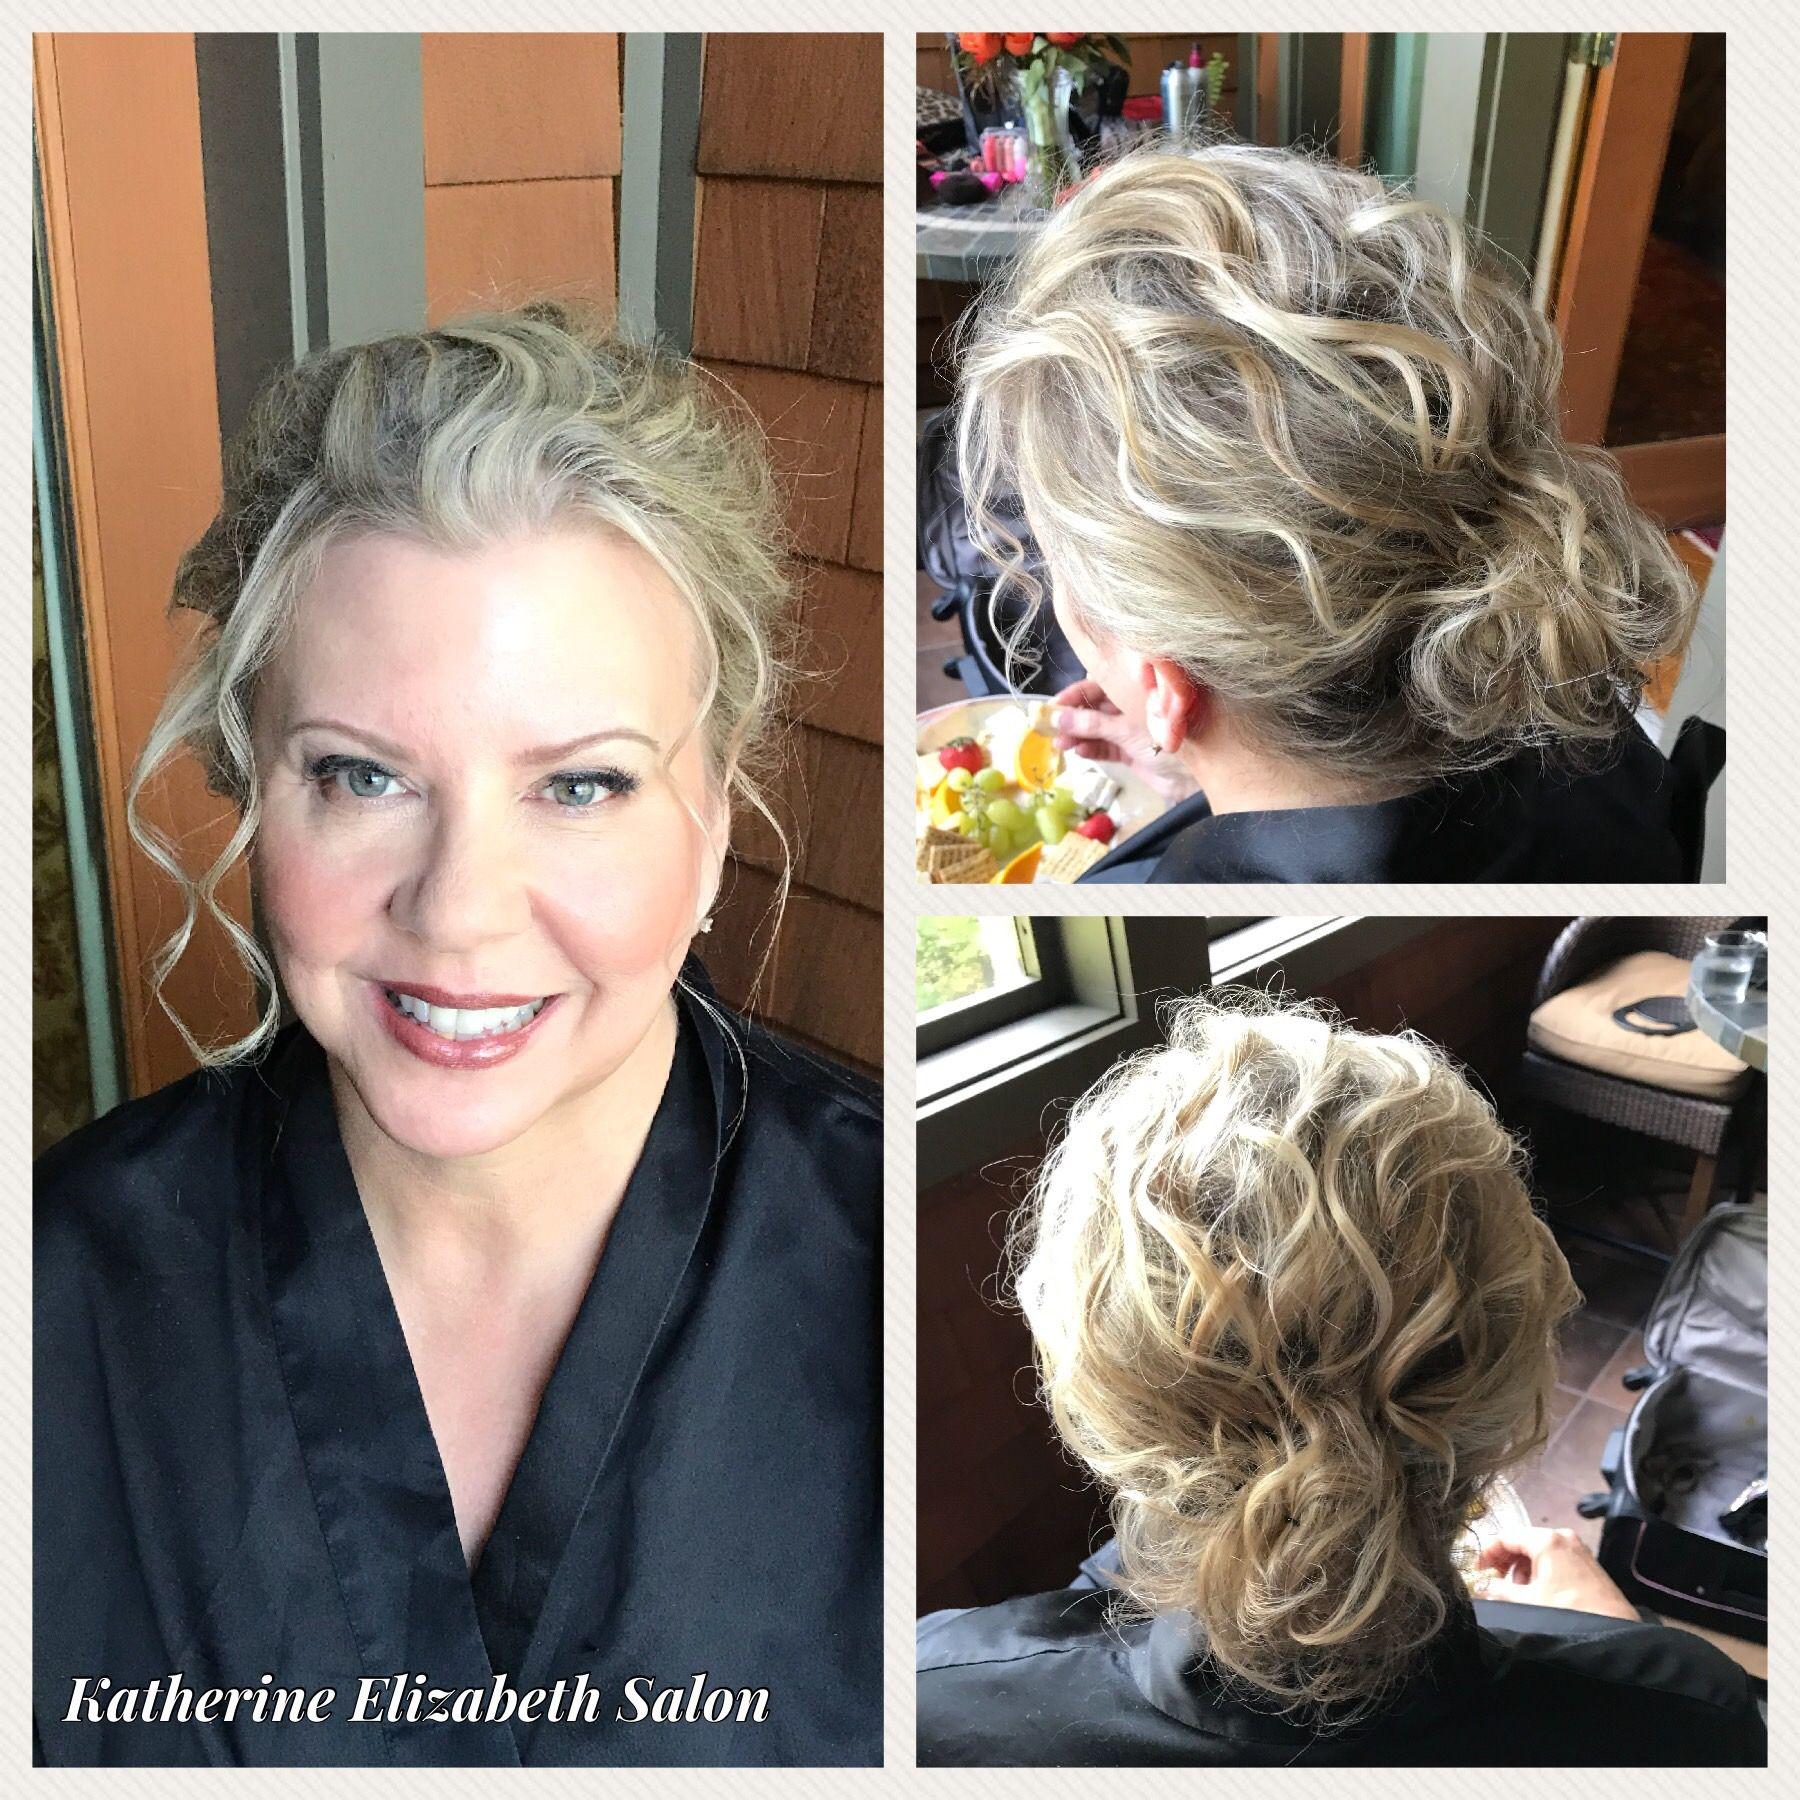 Hair and makeup by kat oropallo katherine elizabeth salon love